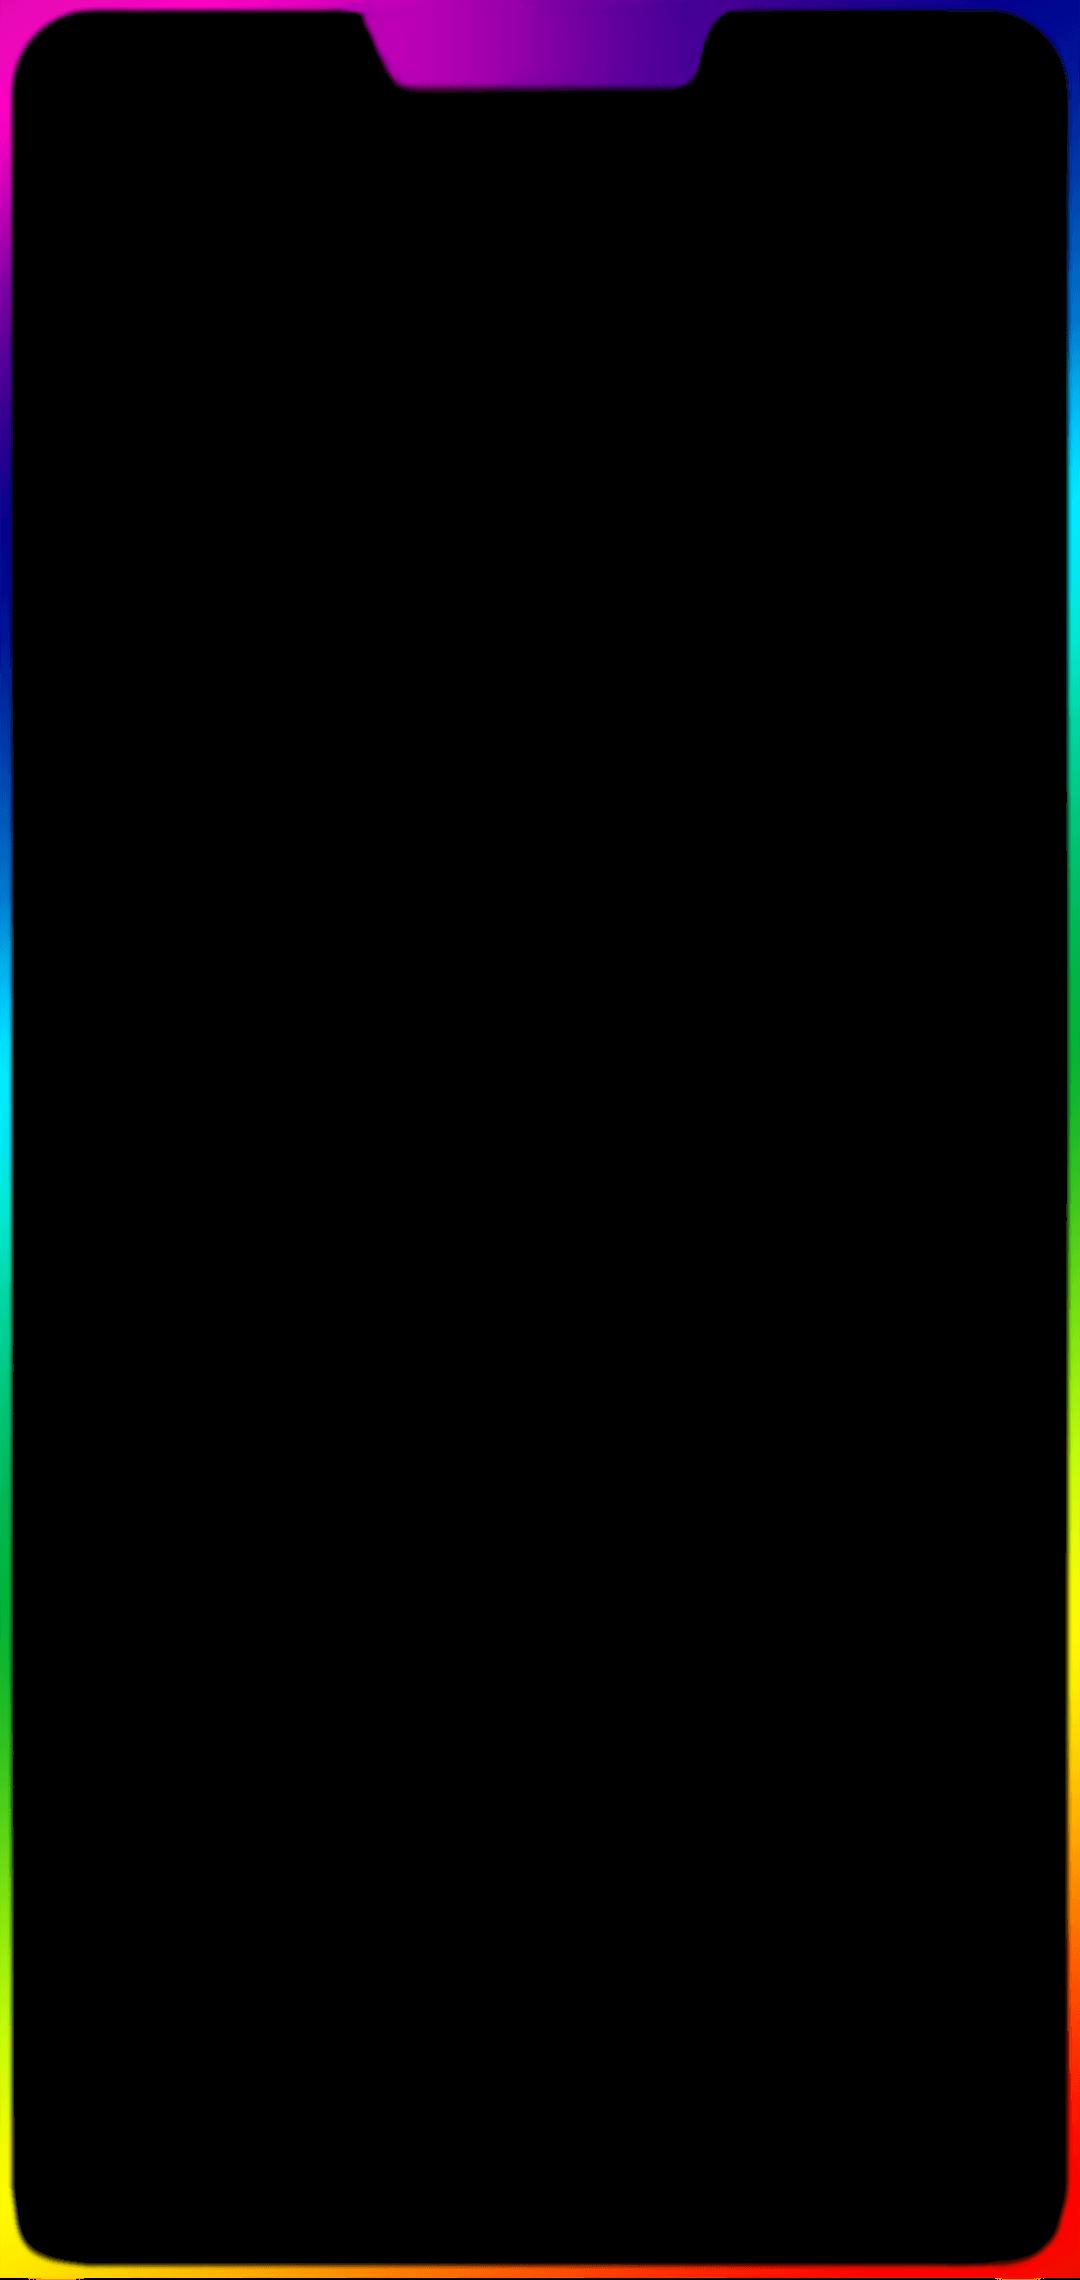 Rainbow Border Wallpaper : rainbow, border, wallpaper, Iphone, Rainbow, Border, Wallpaper